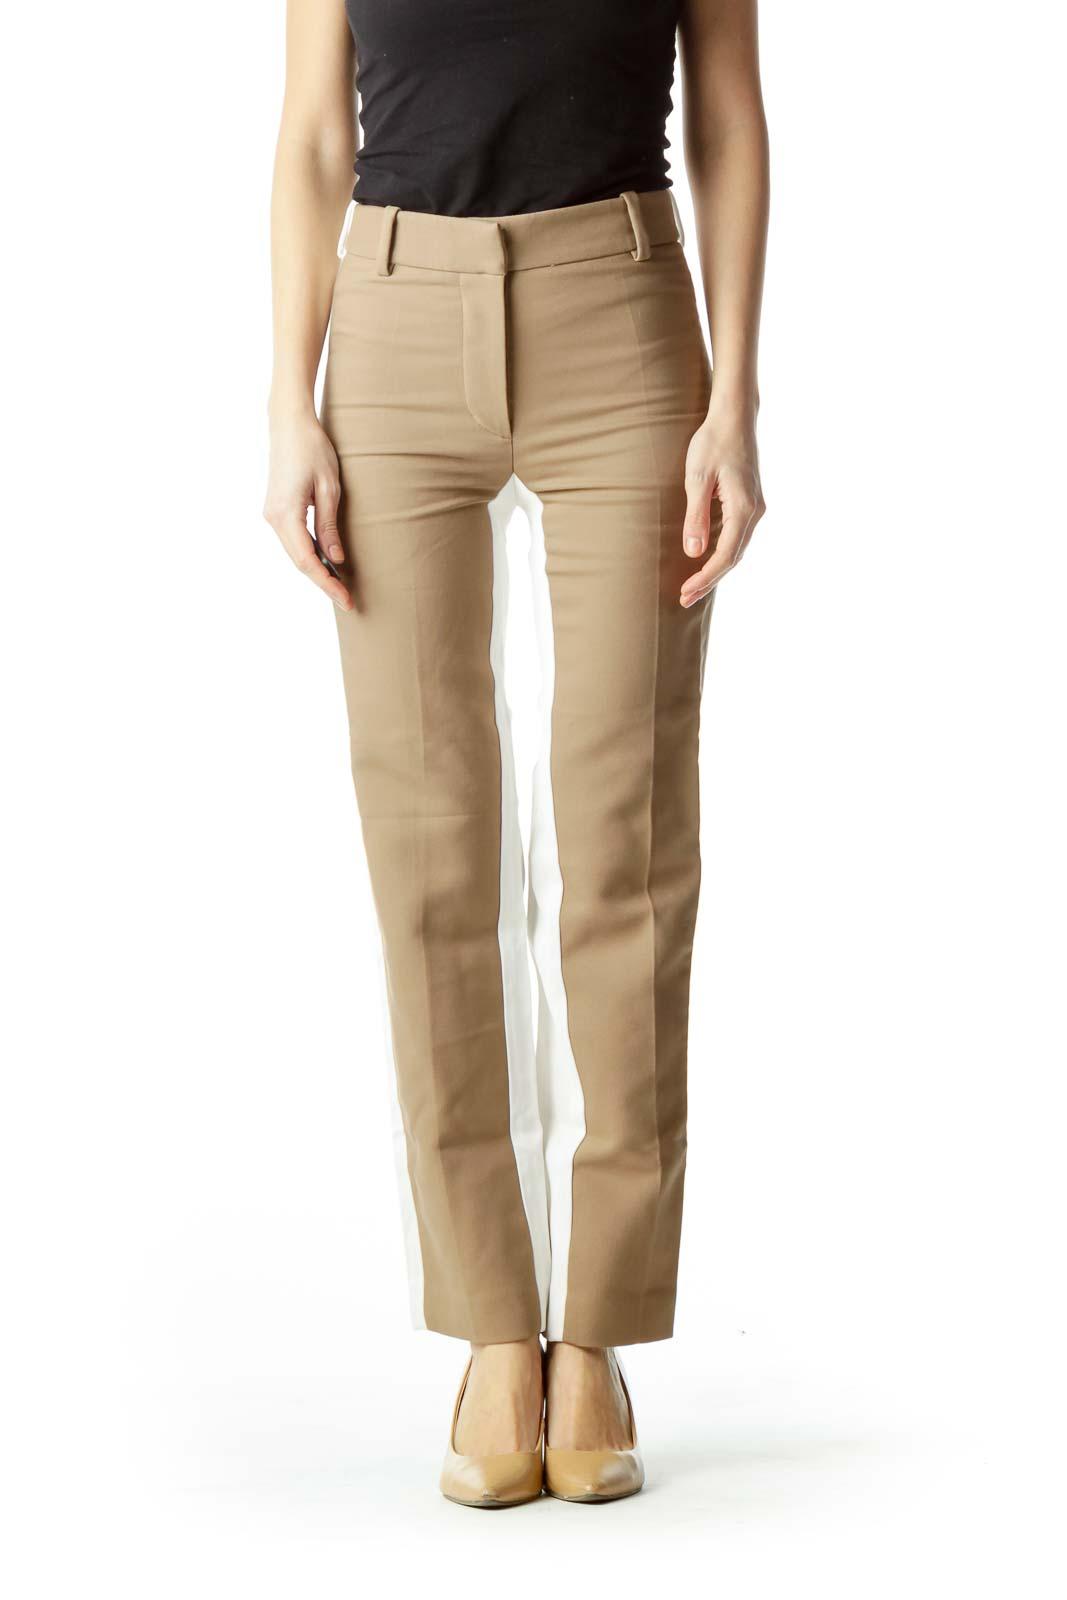 Brown Front Cream Back Skinny Pants